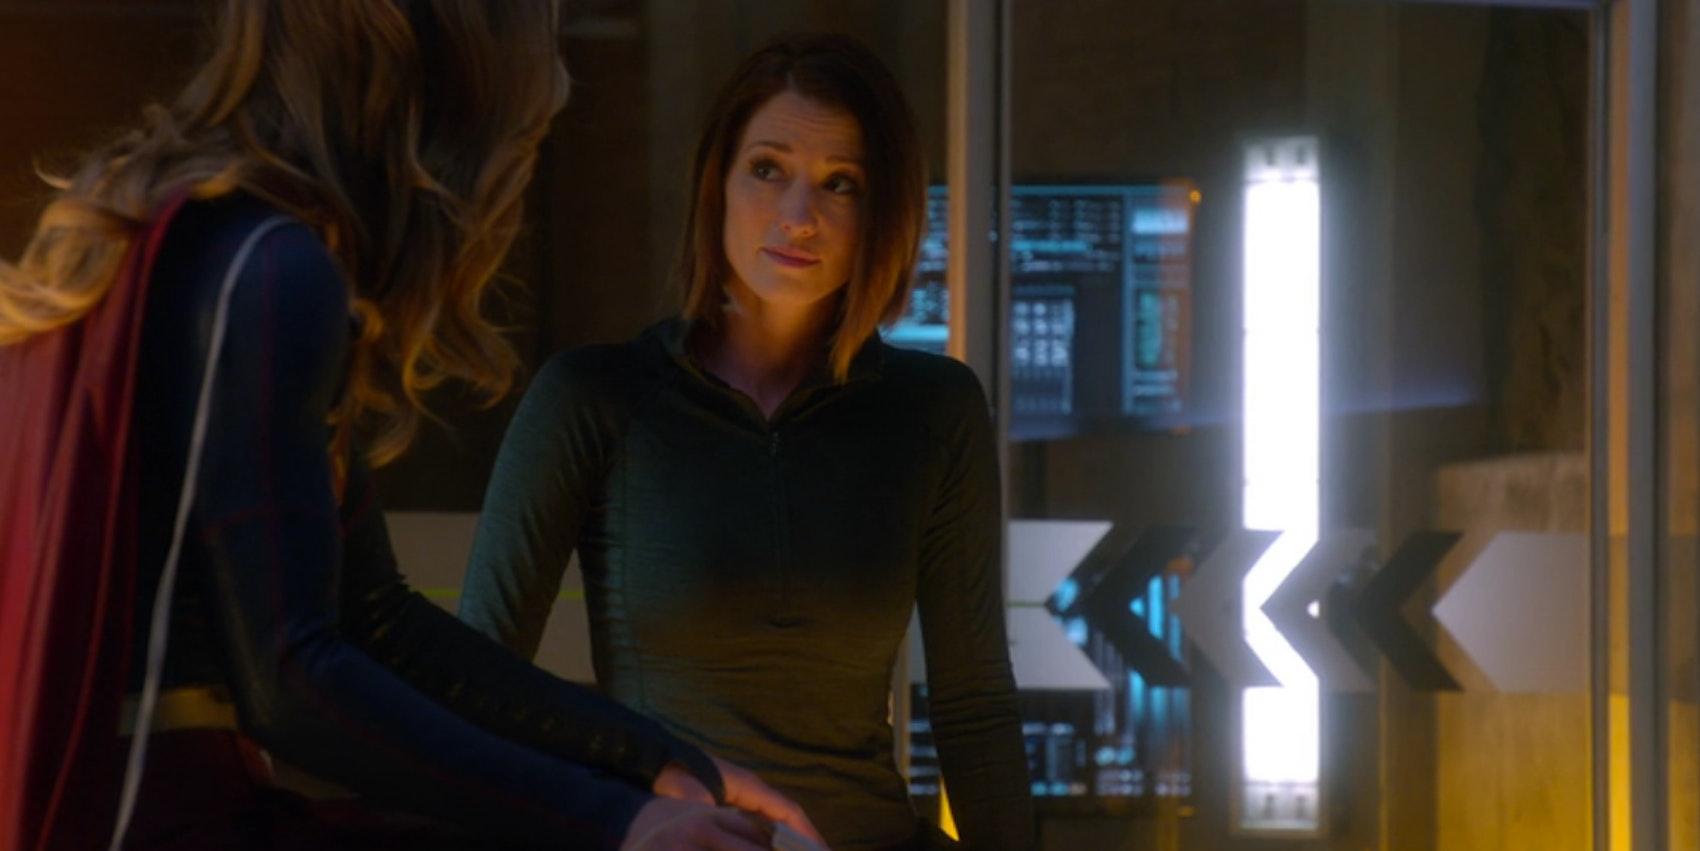 Supergirl and Alex Danvers in 'Supergirl'